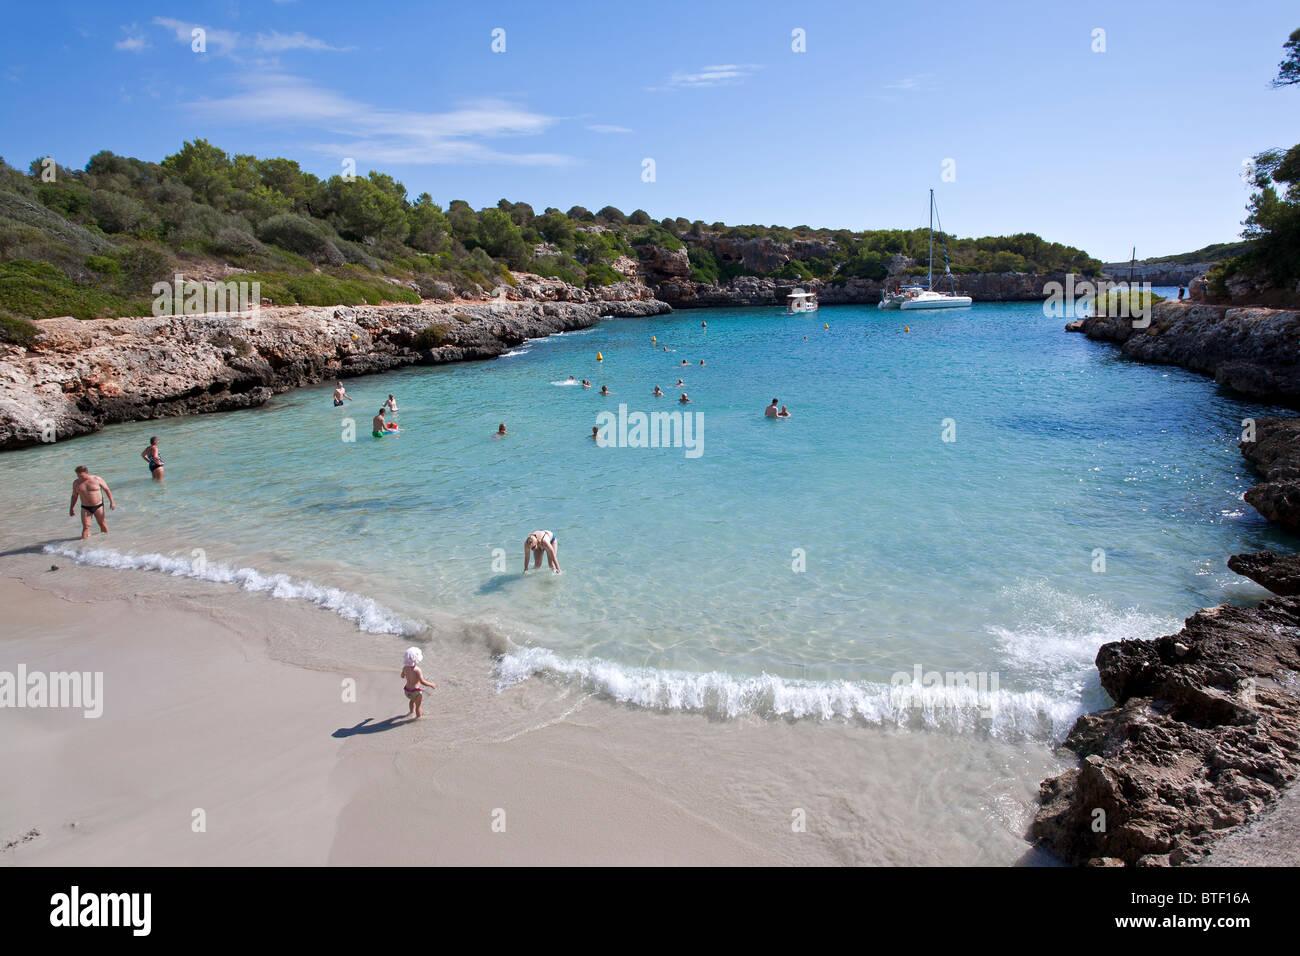 Cala Sa Nau beach. Felanitx. Mallorca Island. Spain - Stock Image